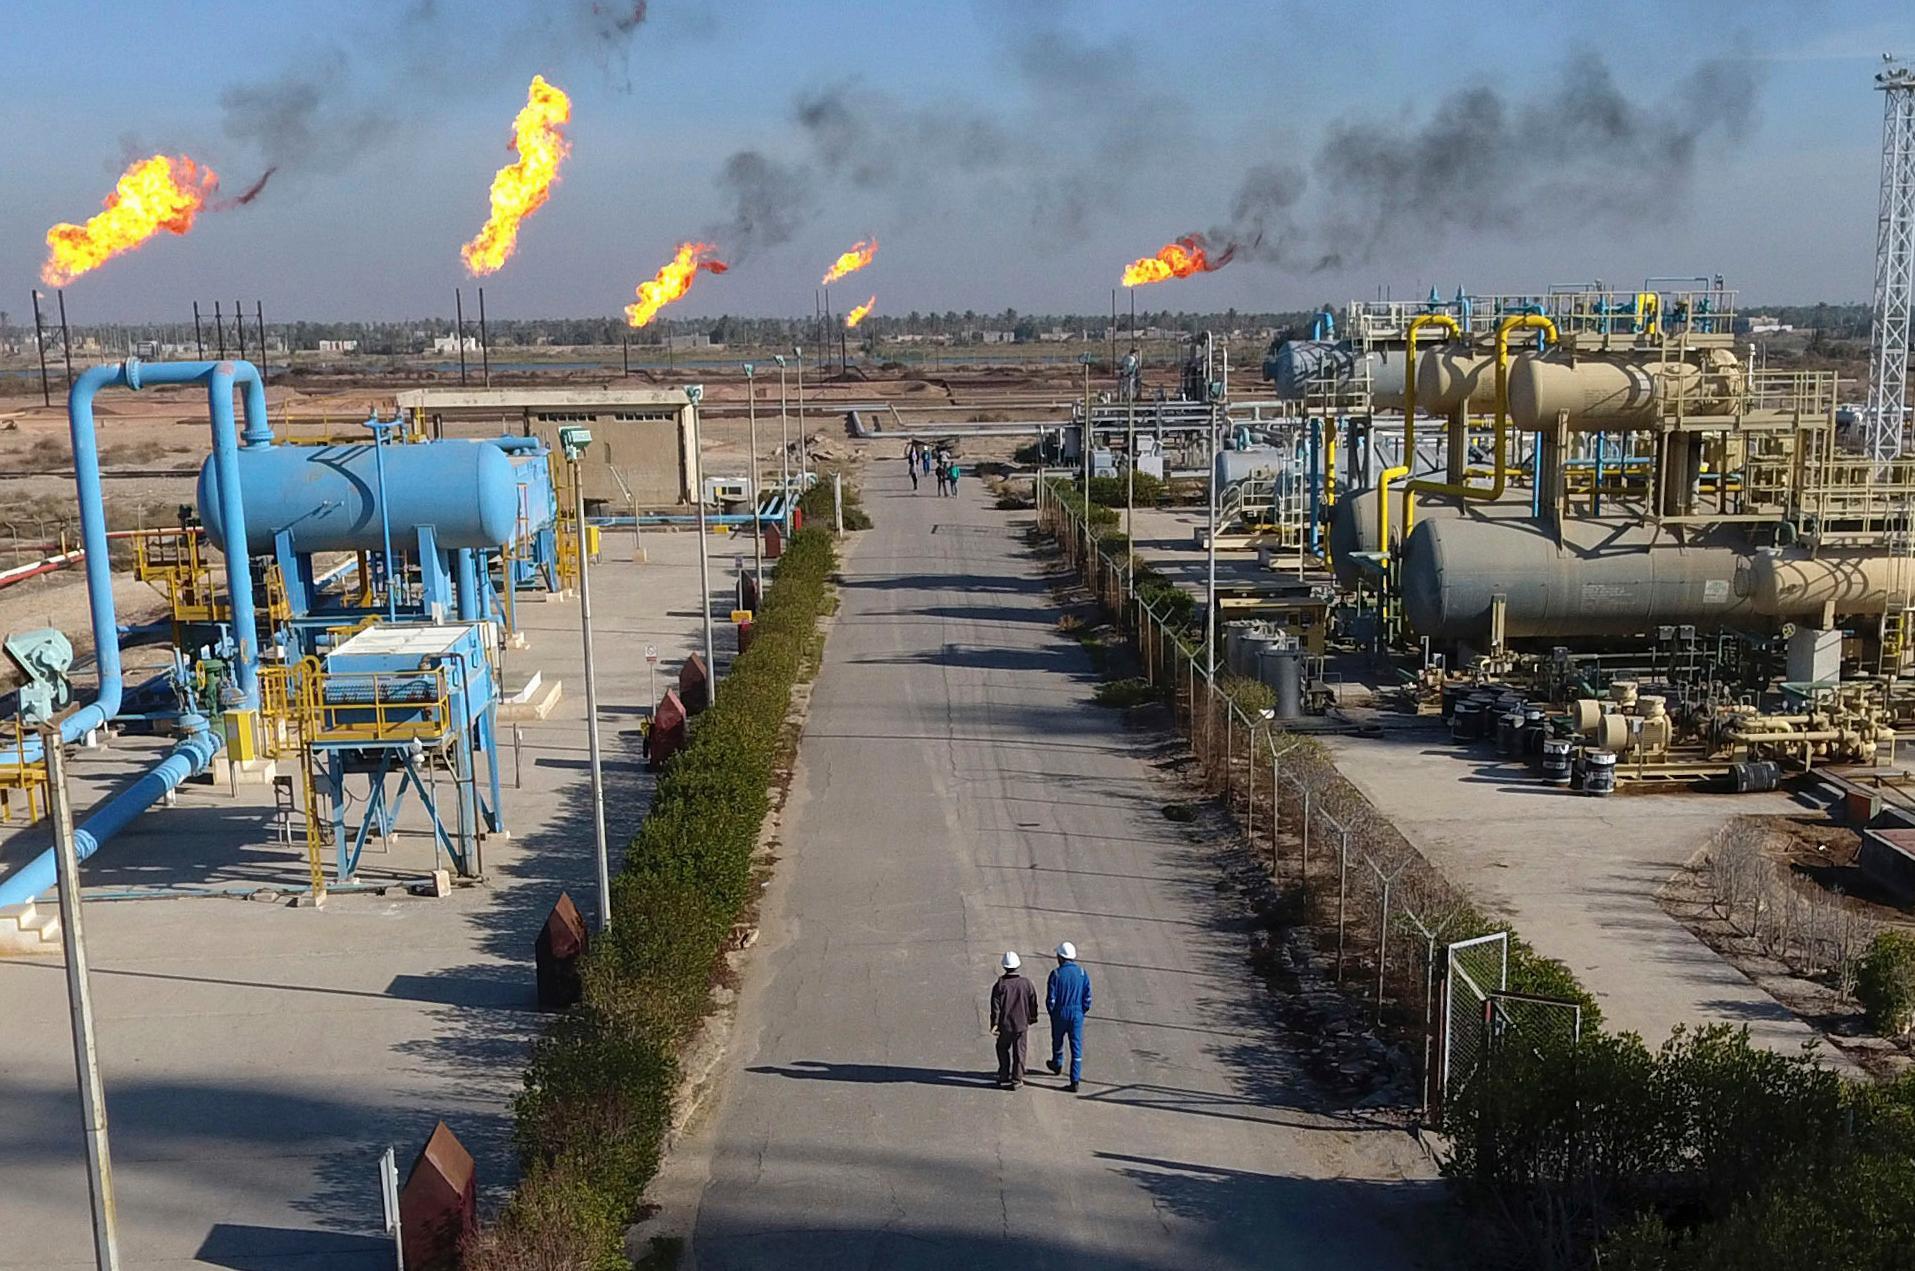 Iraq planning $53B megaproject with ExxonMobil, PetroChina